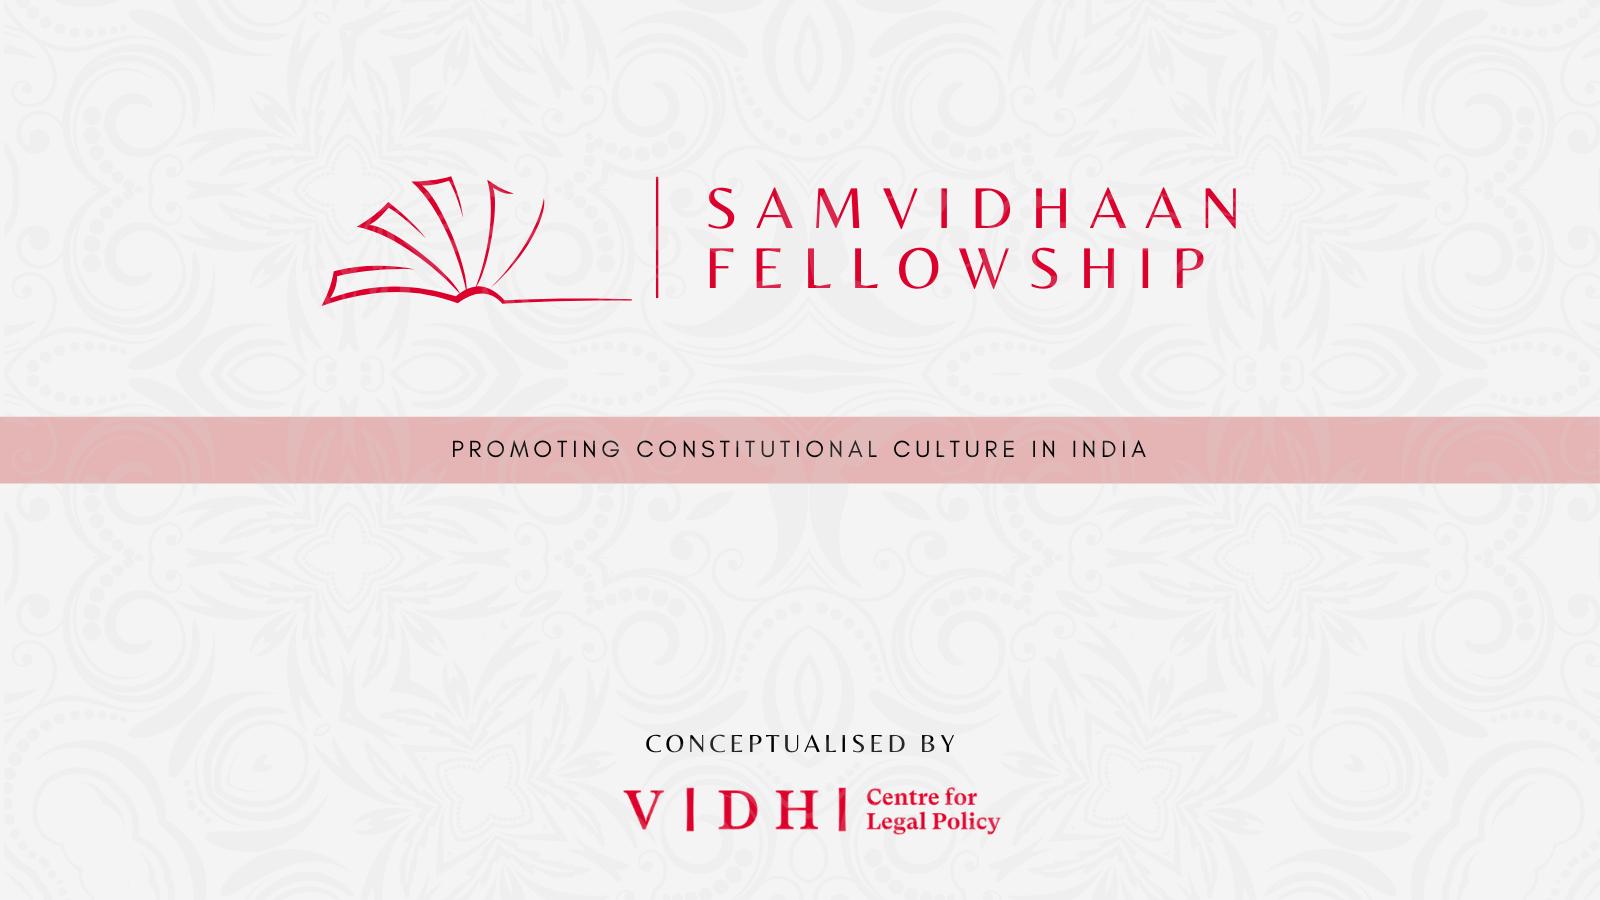 Samvidhaan fellowship